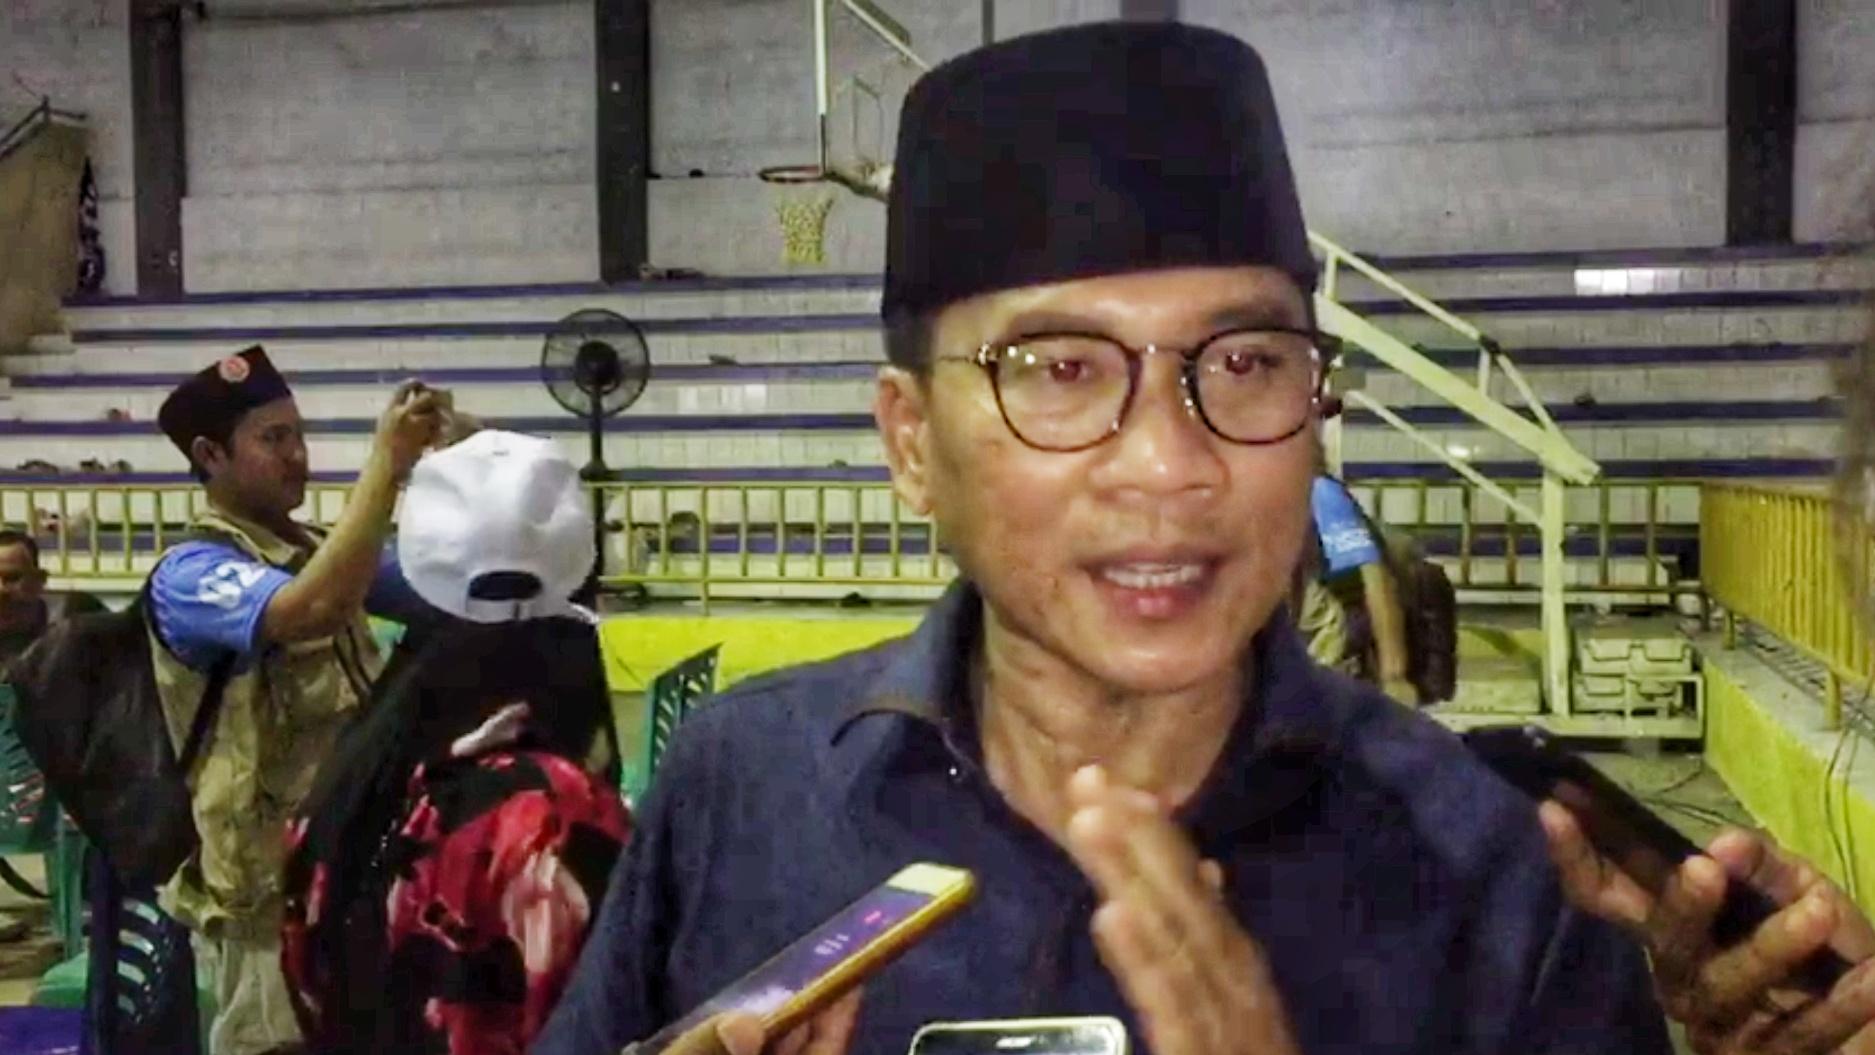 Wakil Ketua Badan Pemenangan Nasional (BPN) Yandri Susanto